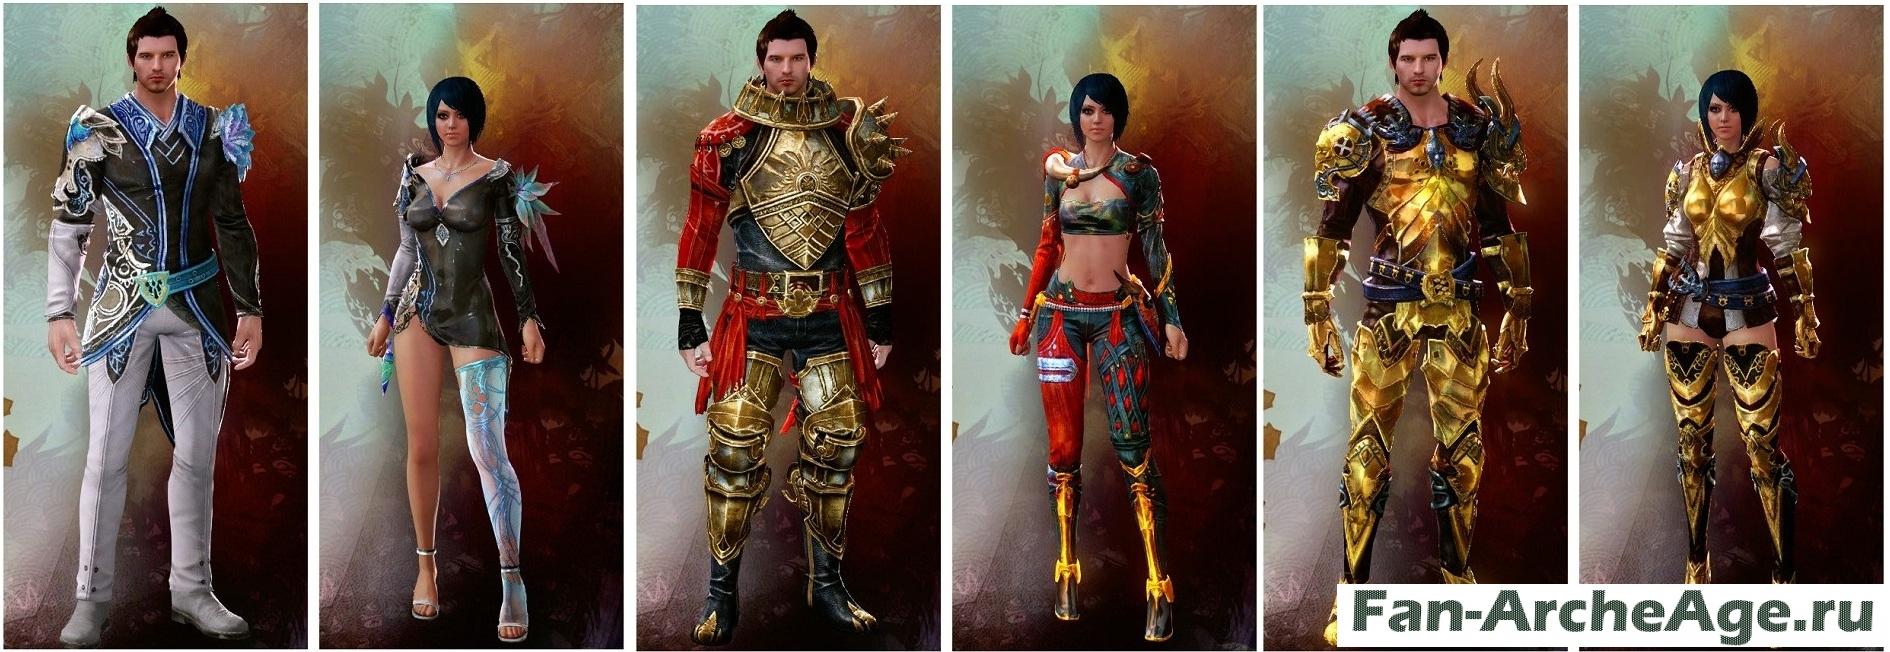 ArcheAge костюмы из библиотеки fan-archeage.ru